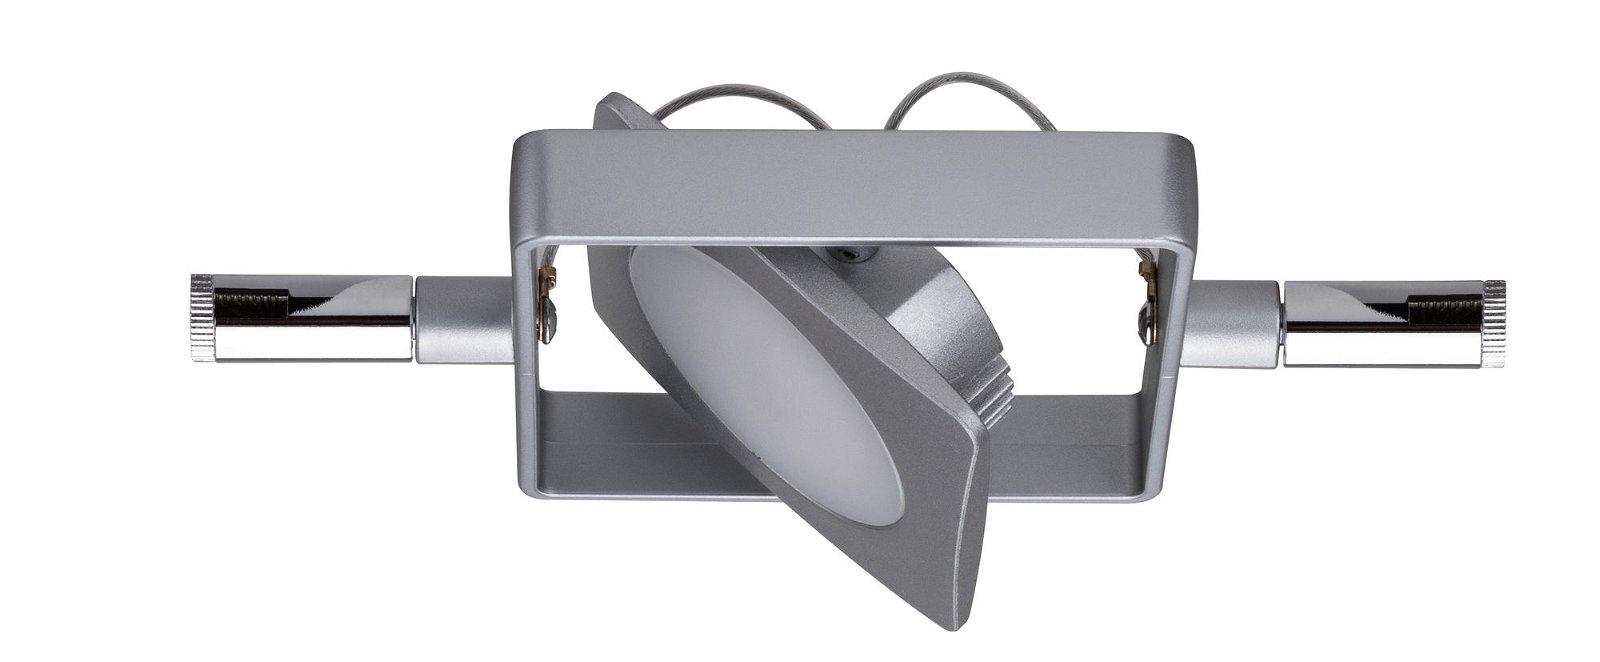 LED Seilsystem MacLED Einzelspot 200lm 4W 2700K 12V Chrom matt